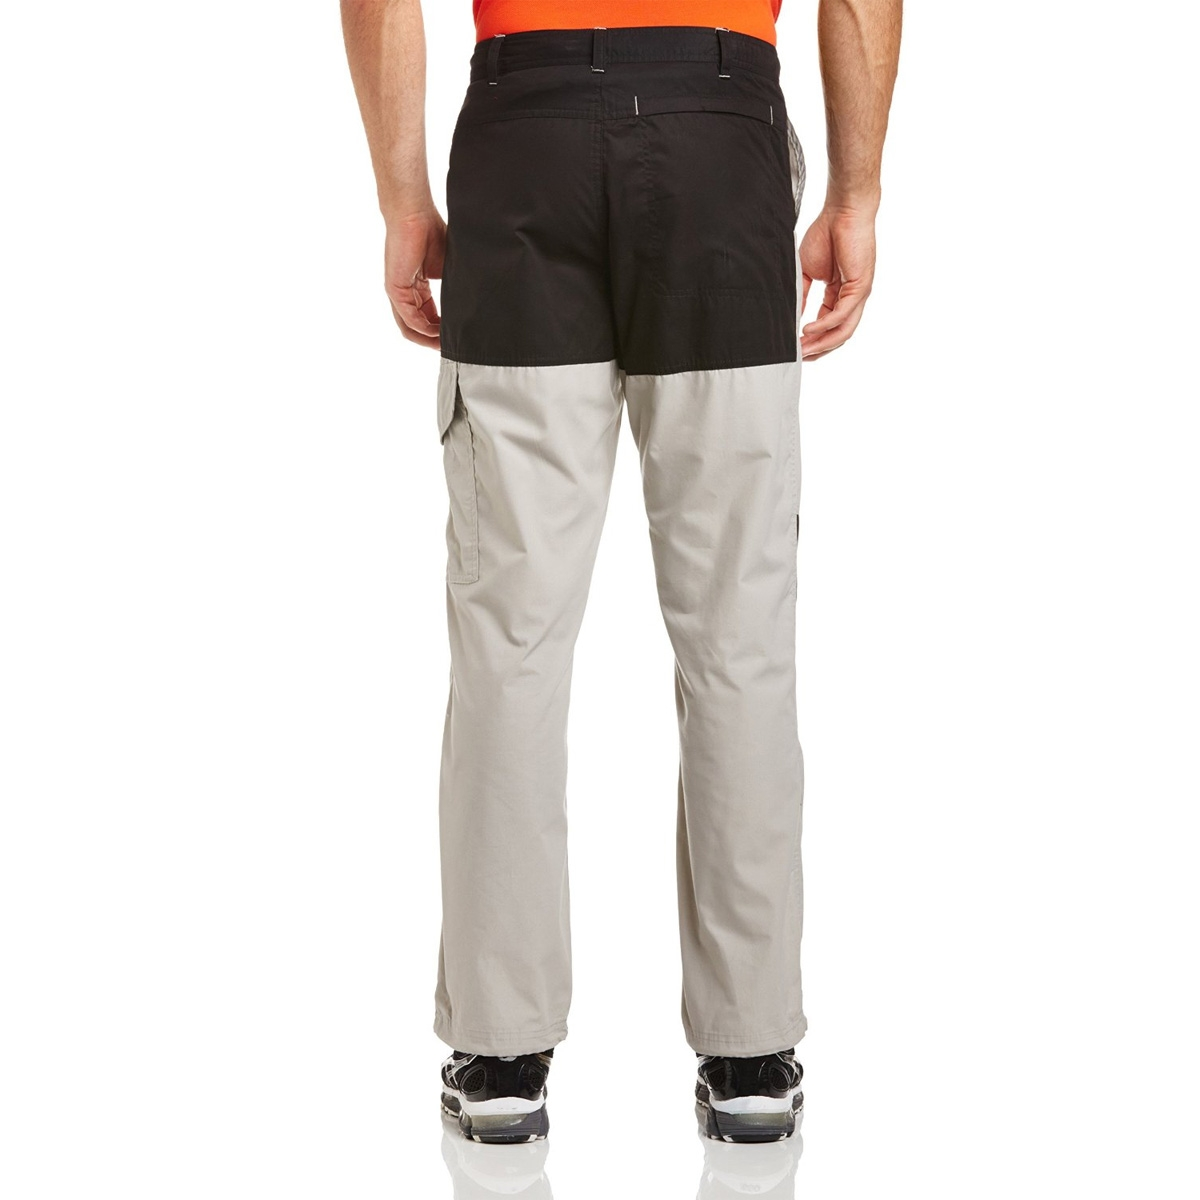 Bear Grylls Pants | Bear Grylls Clothing | Bear Grylls Hiking Boots